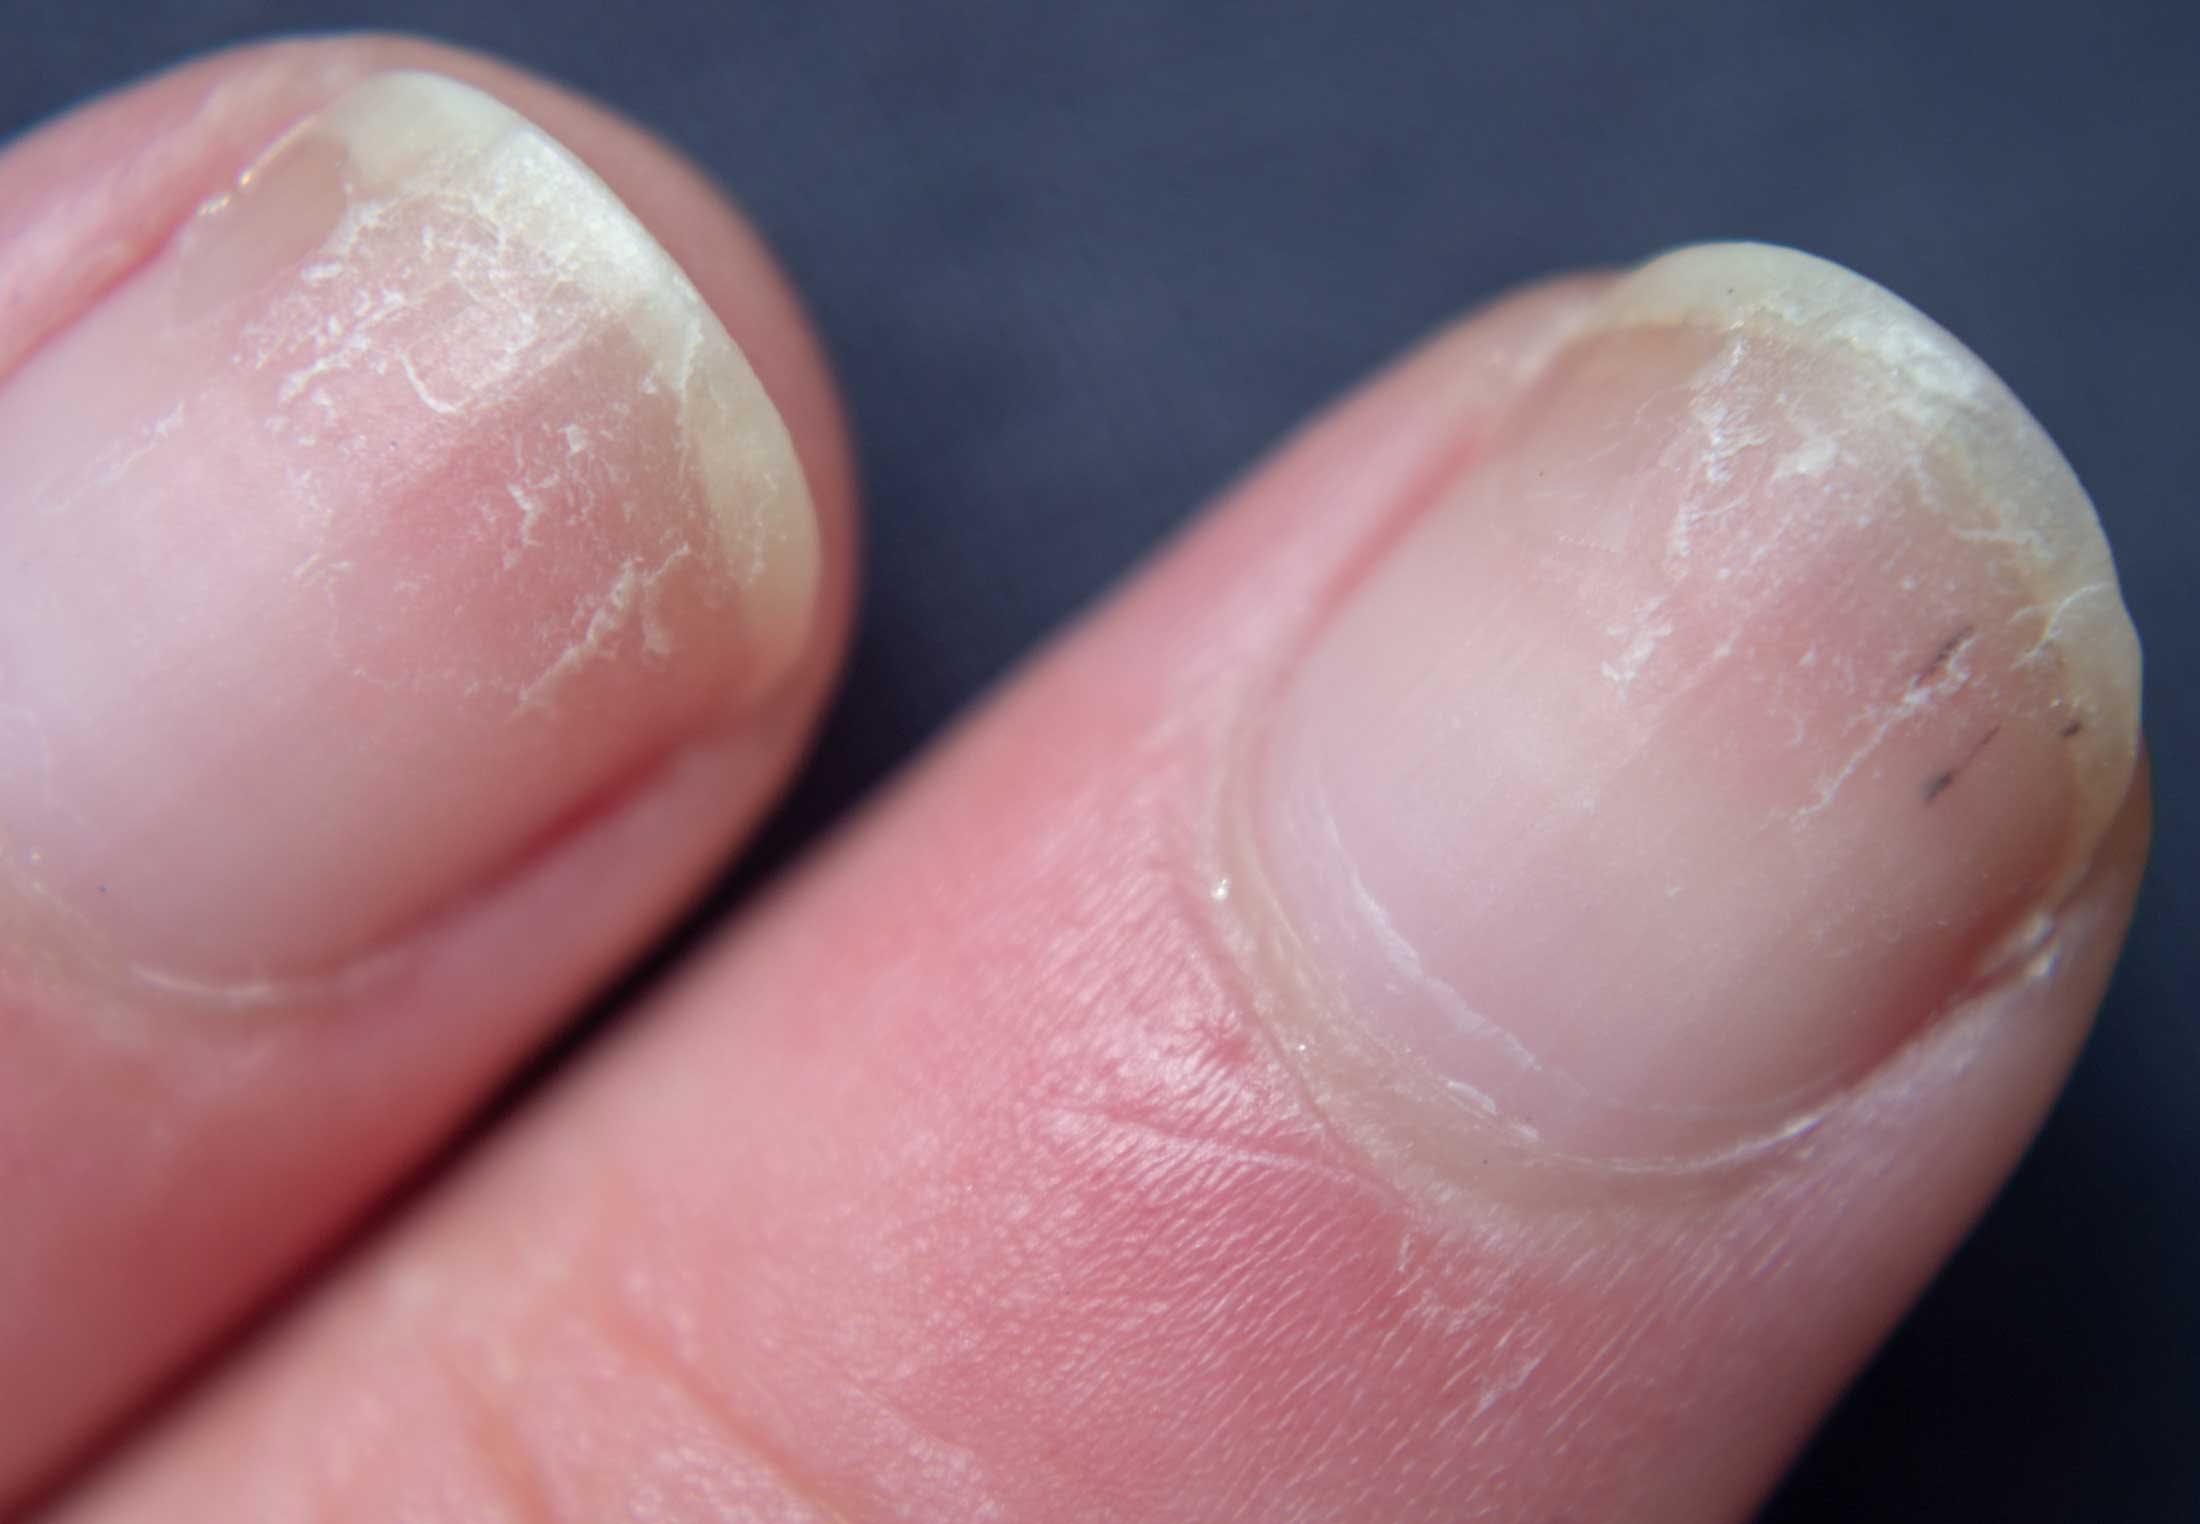 naglar som skivar sig brist